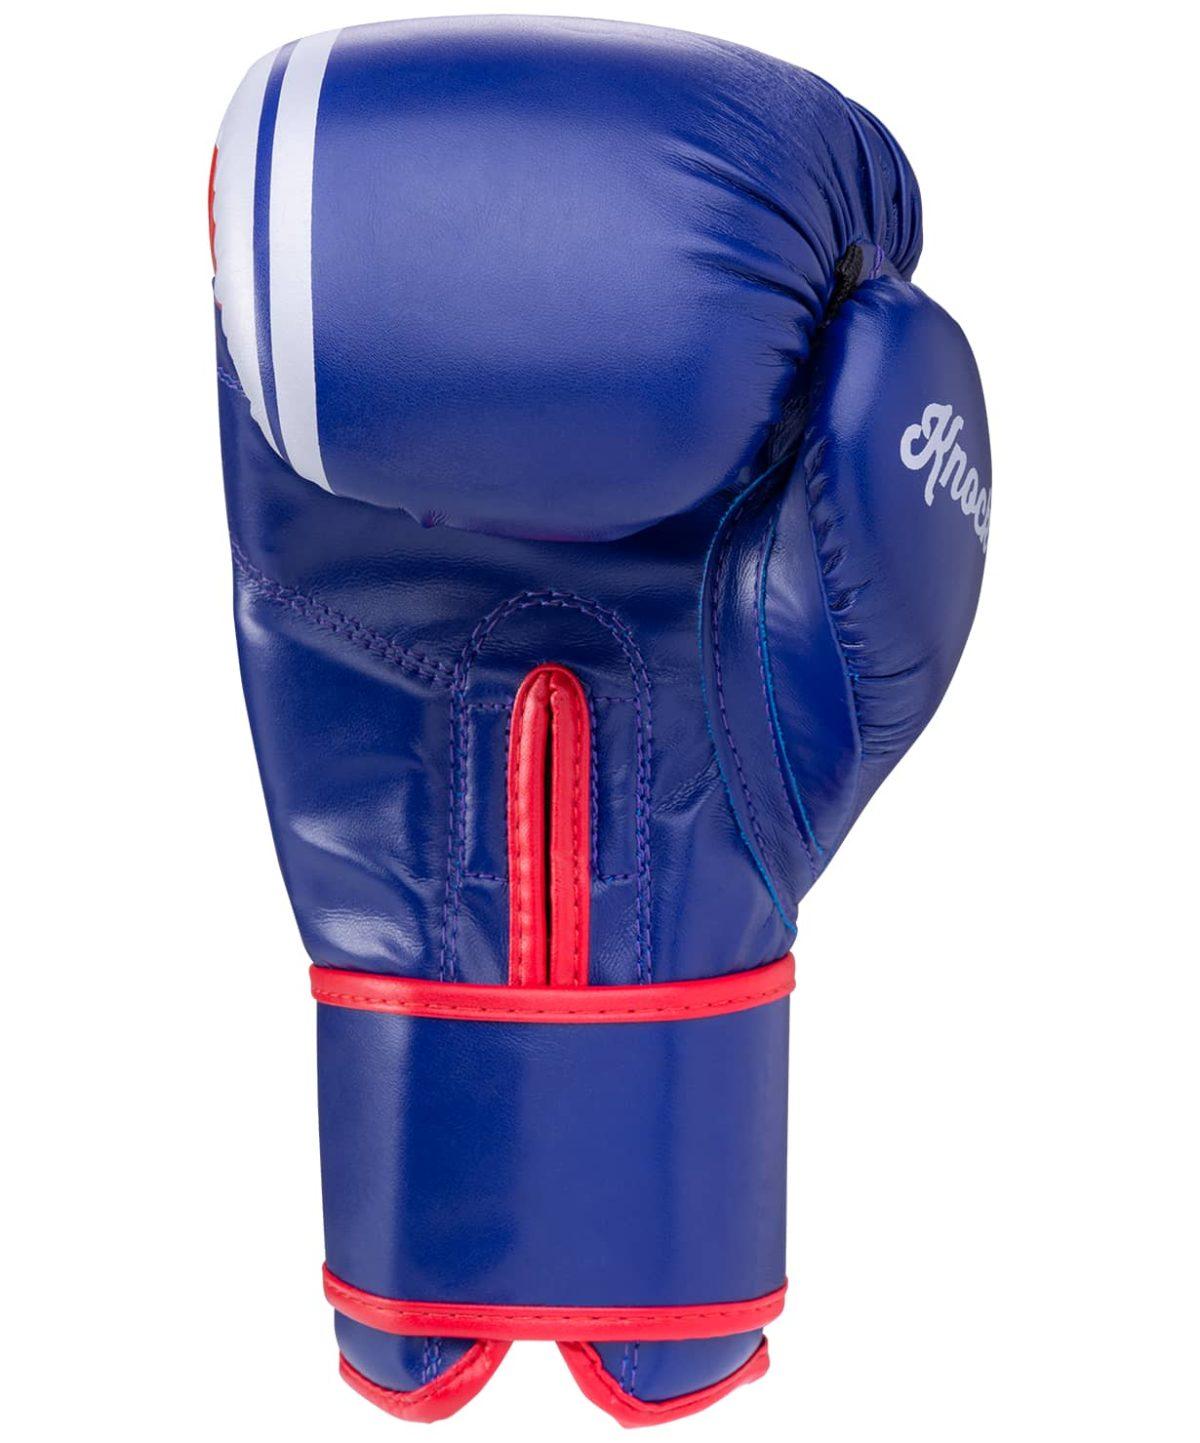 GREEN HILL Перчатки боксерские 12 oz Knockout  BGK-2266: синий - 2